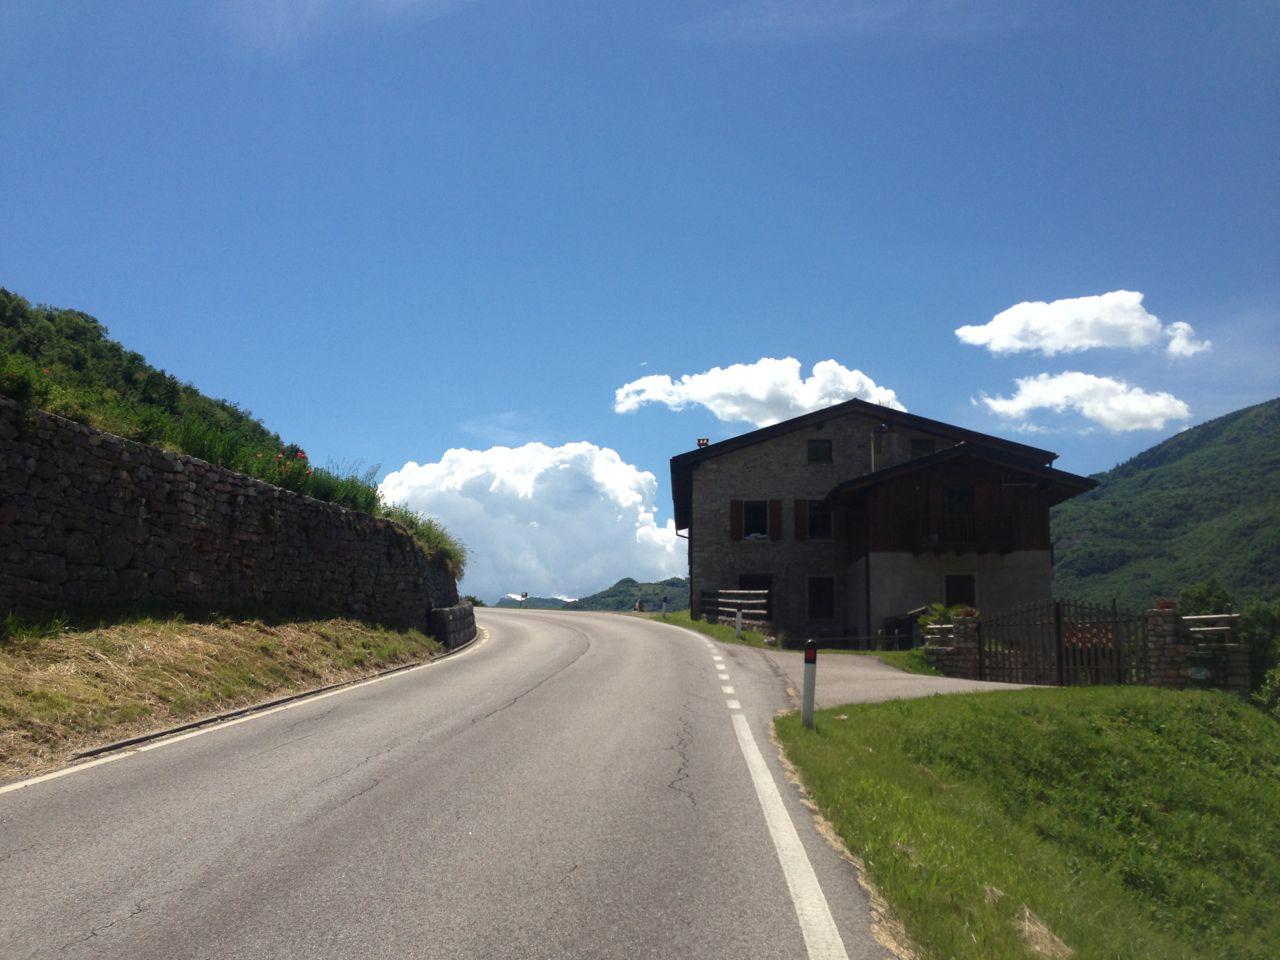 Giro d'Italia Bergzeitfahrstrecke nach Ronzo - Chienis